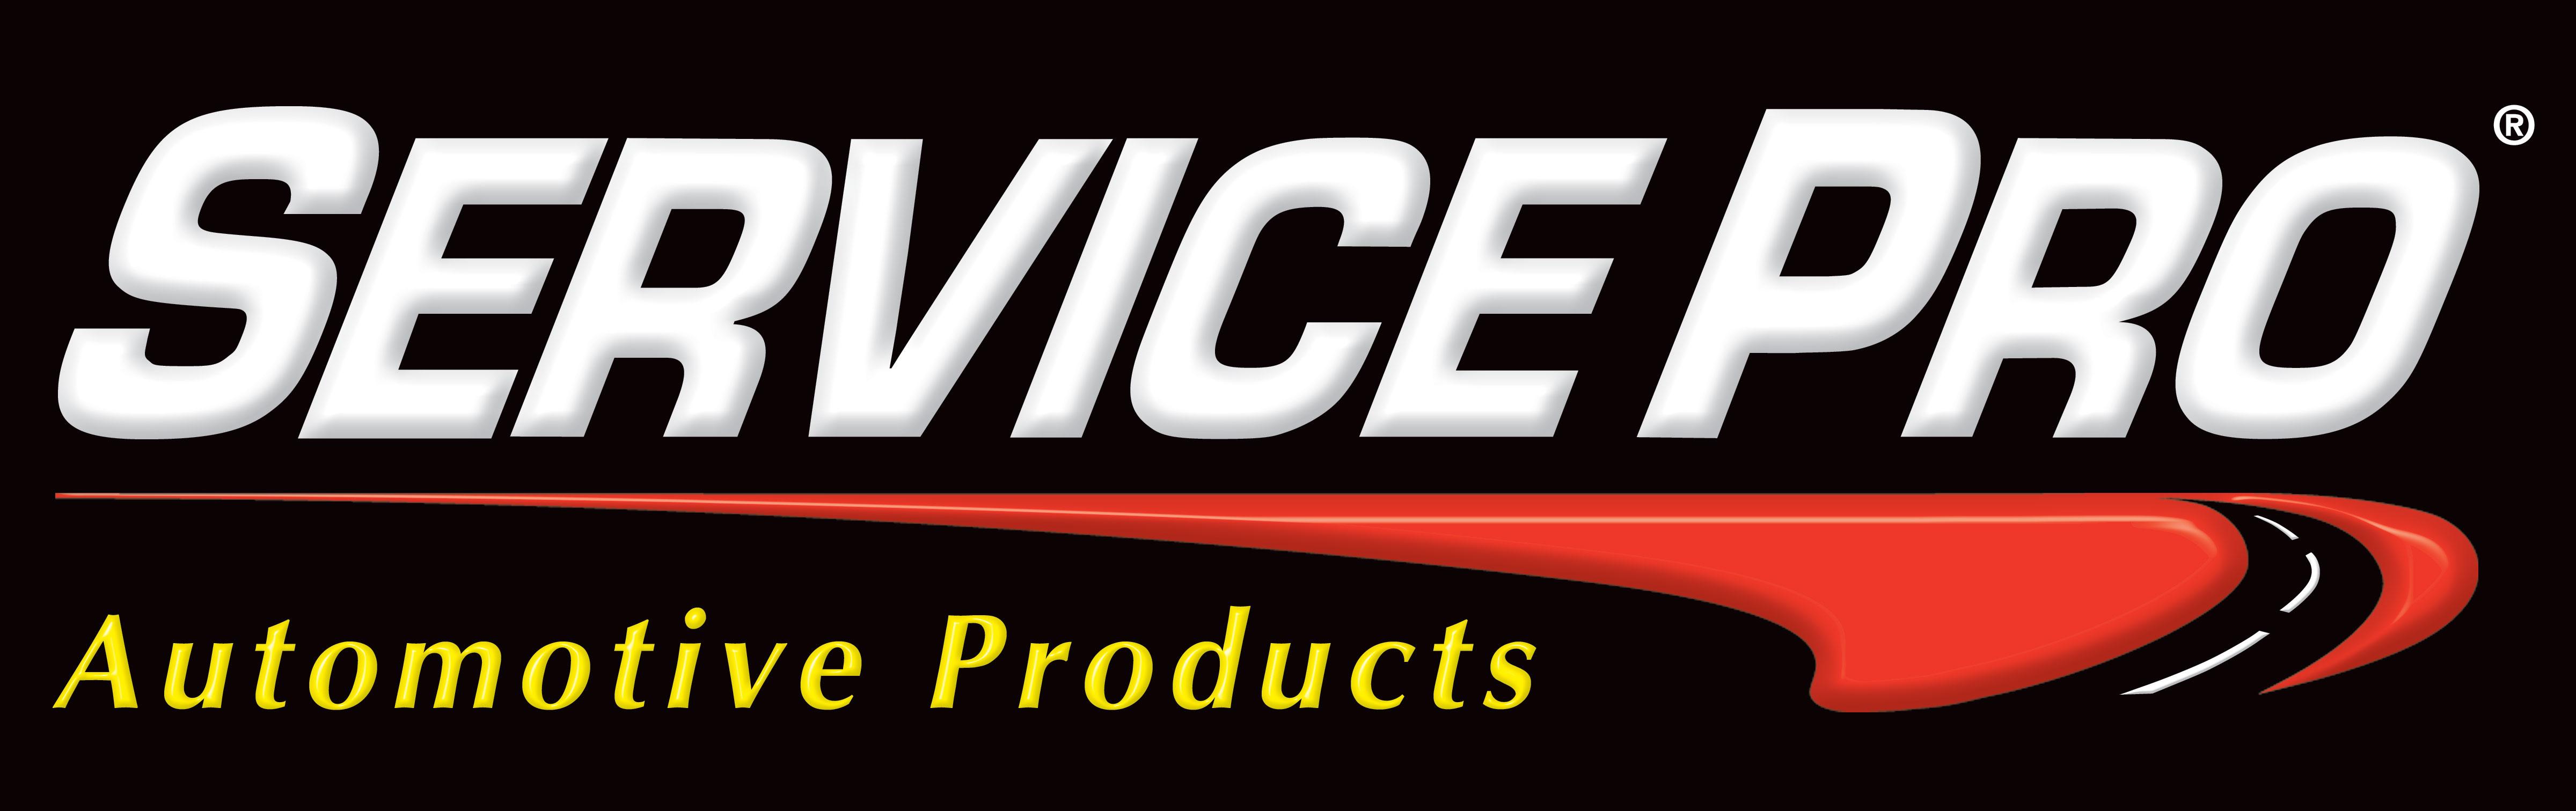 Service-Pro-logo-Wht